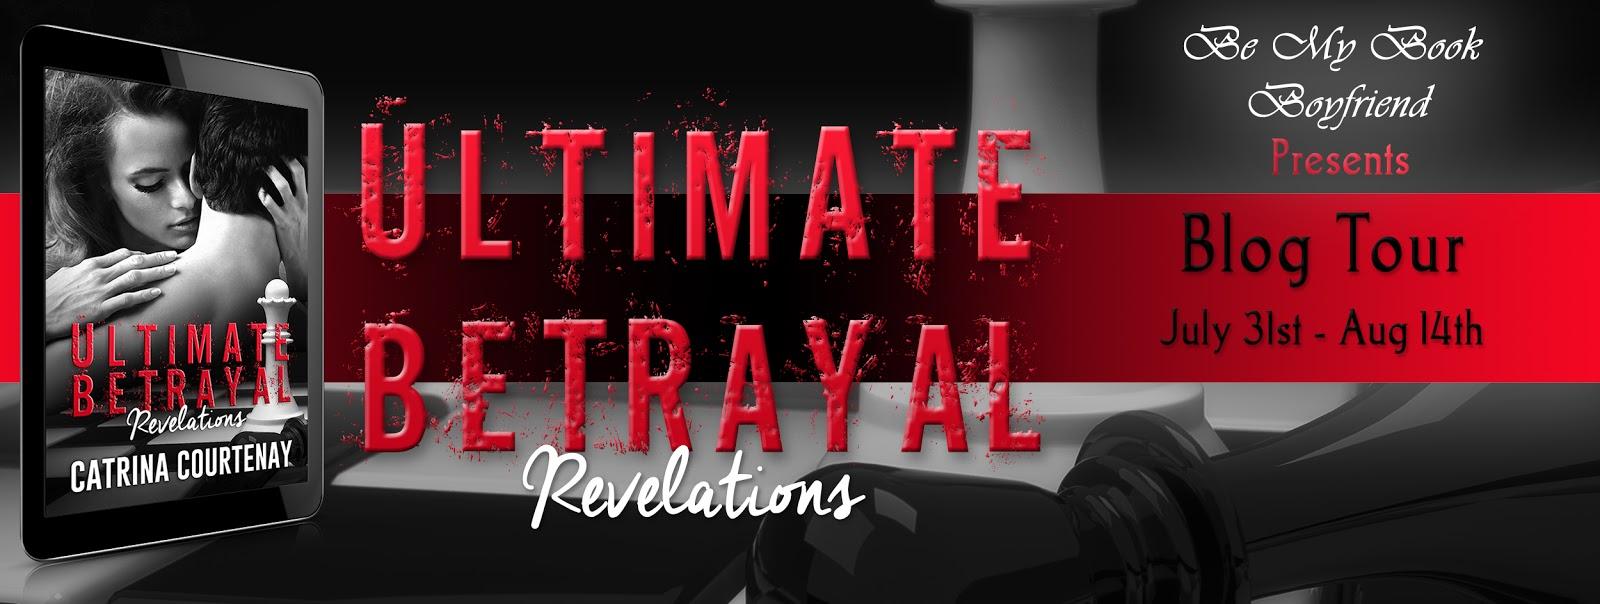 Blog Tour For Catrina Courtenay's Ultimate Betrayal Revelations